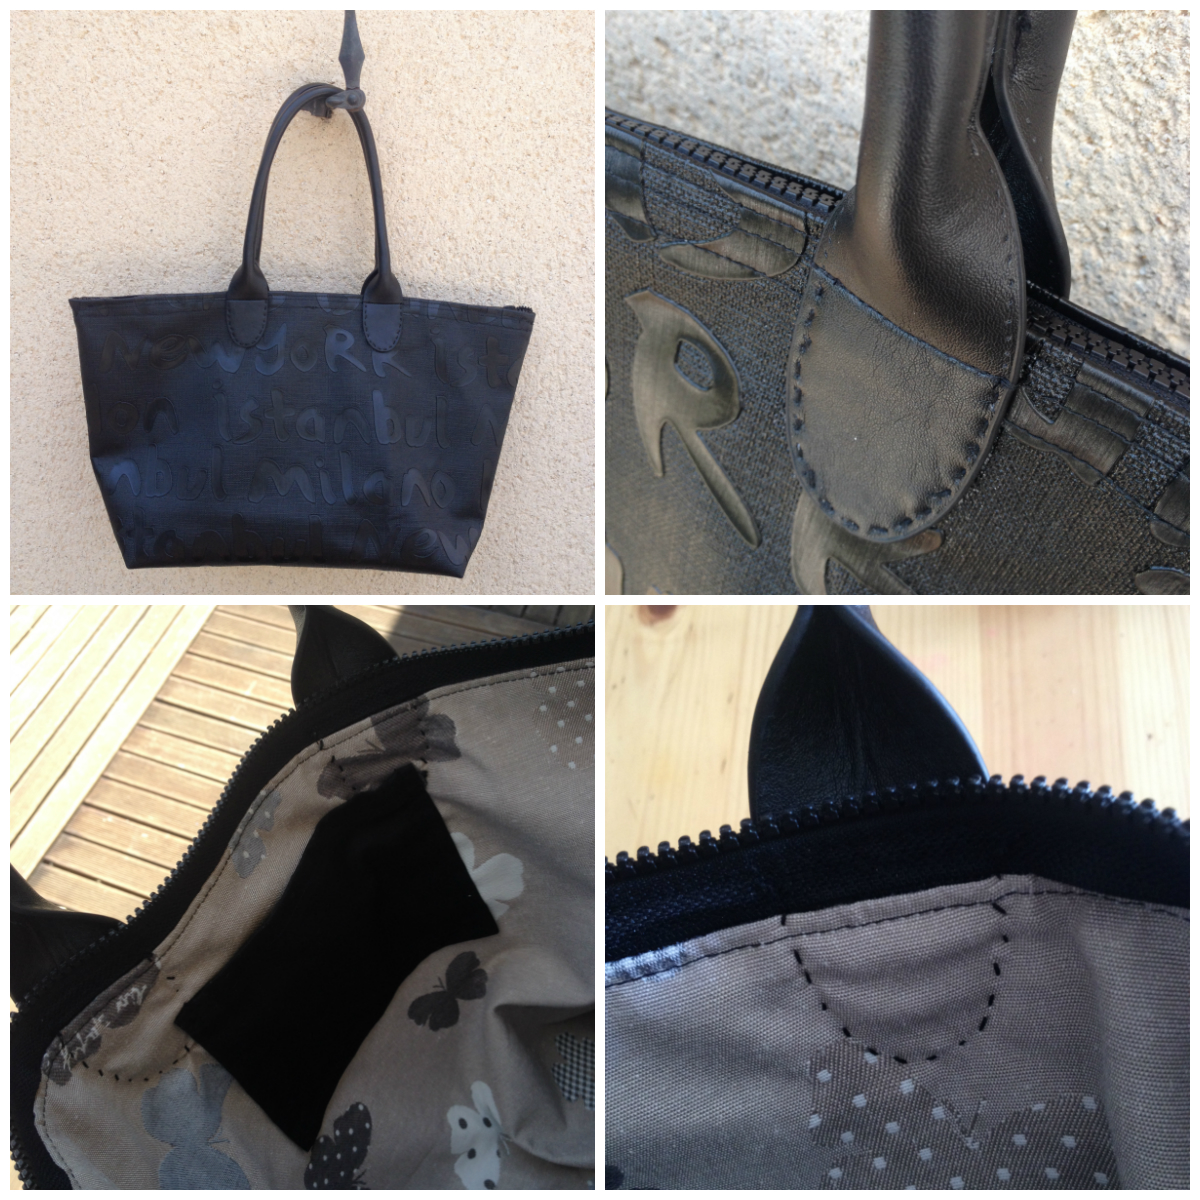 Filo Folding aghi Big Tuto Way Longchamps Of Bag e rqXwTx5r